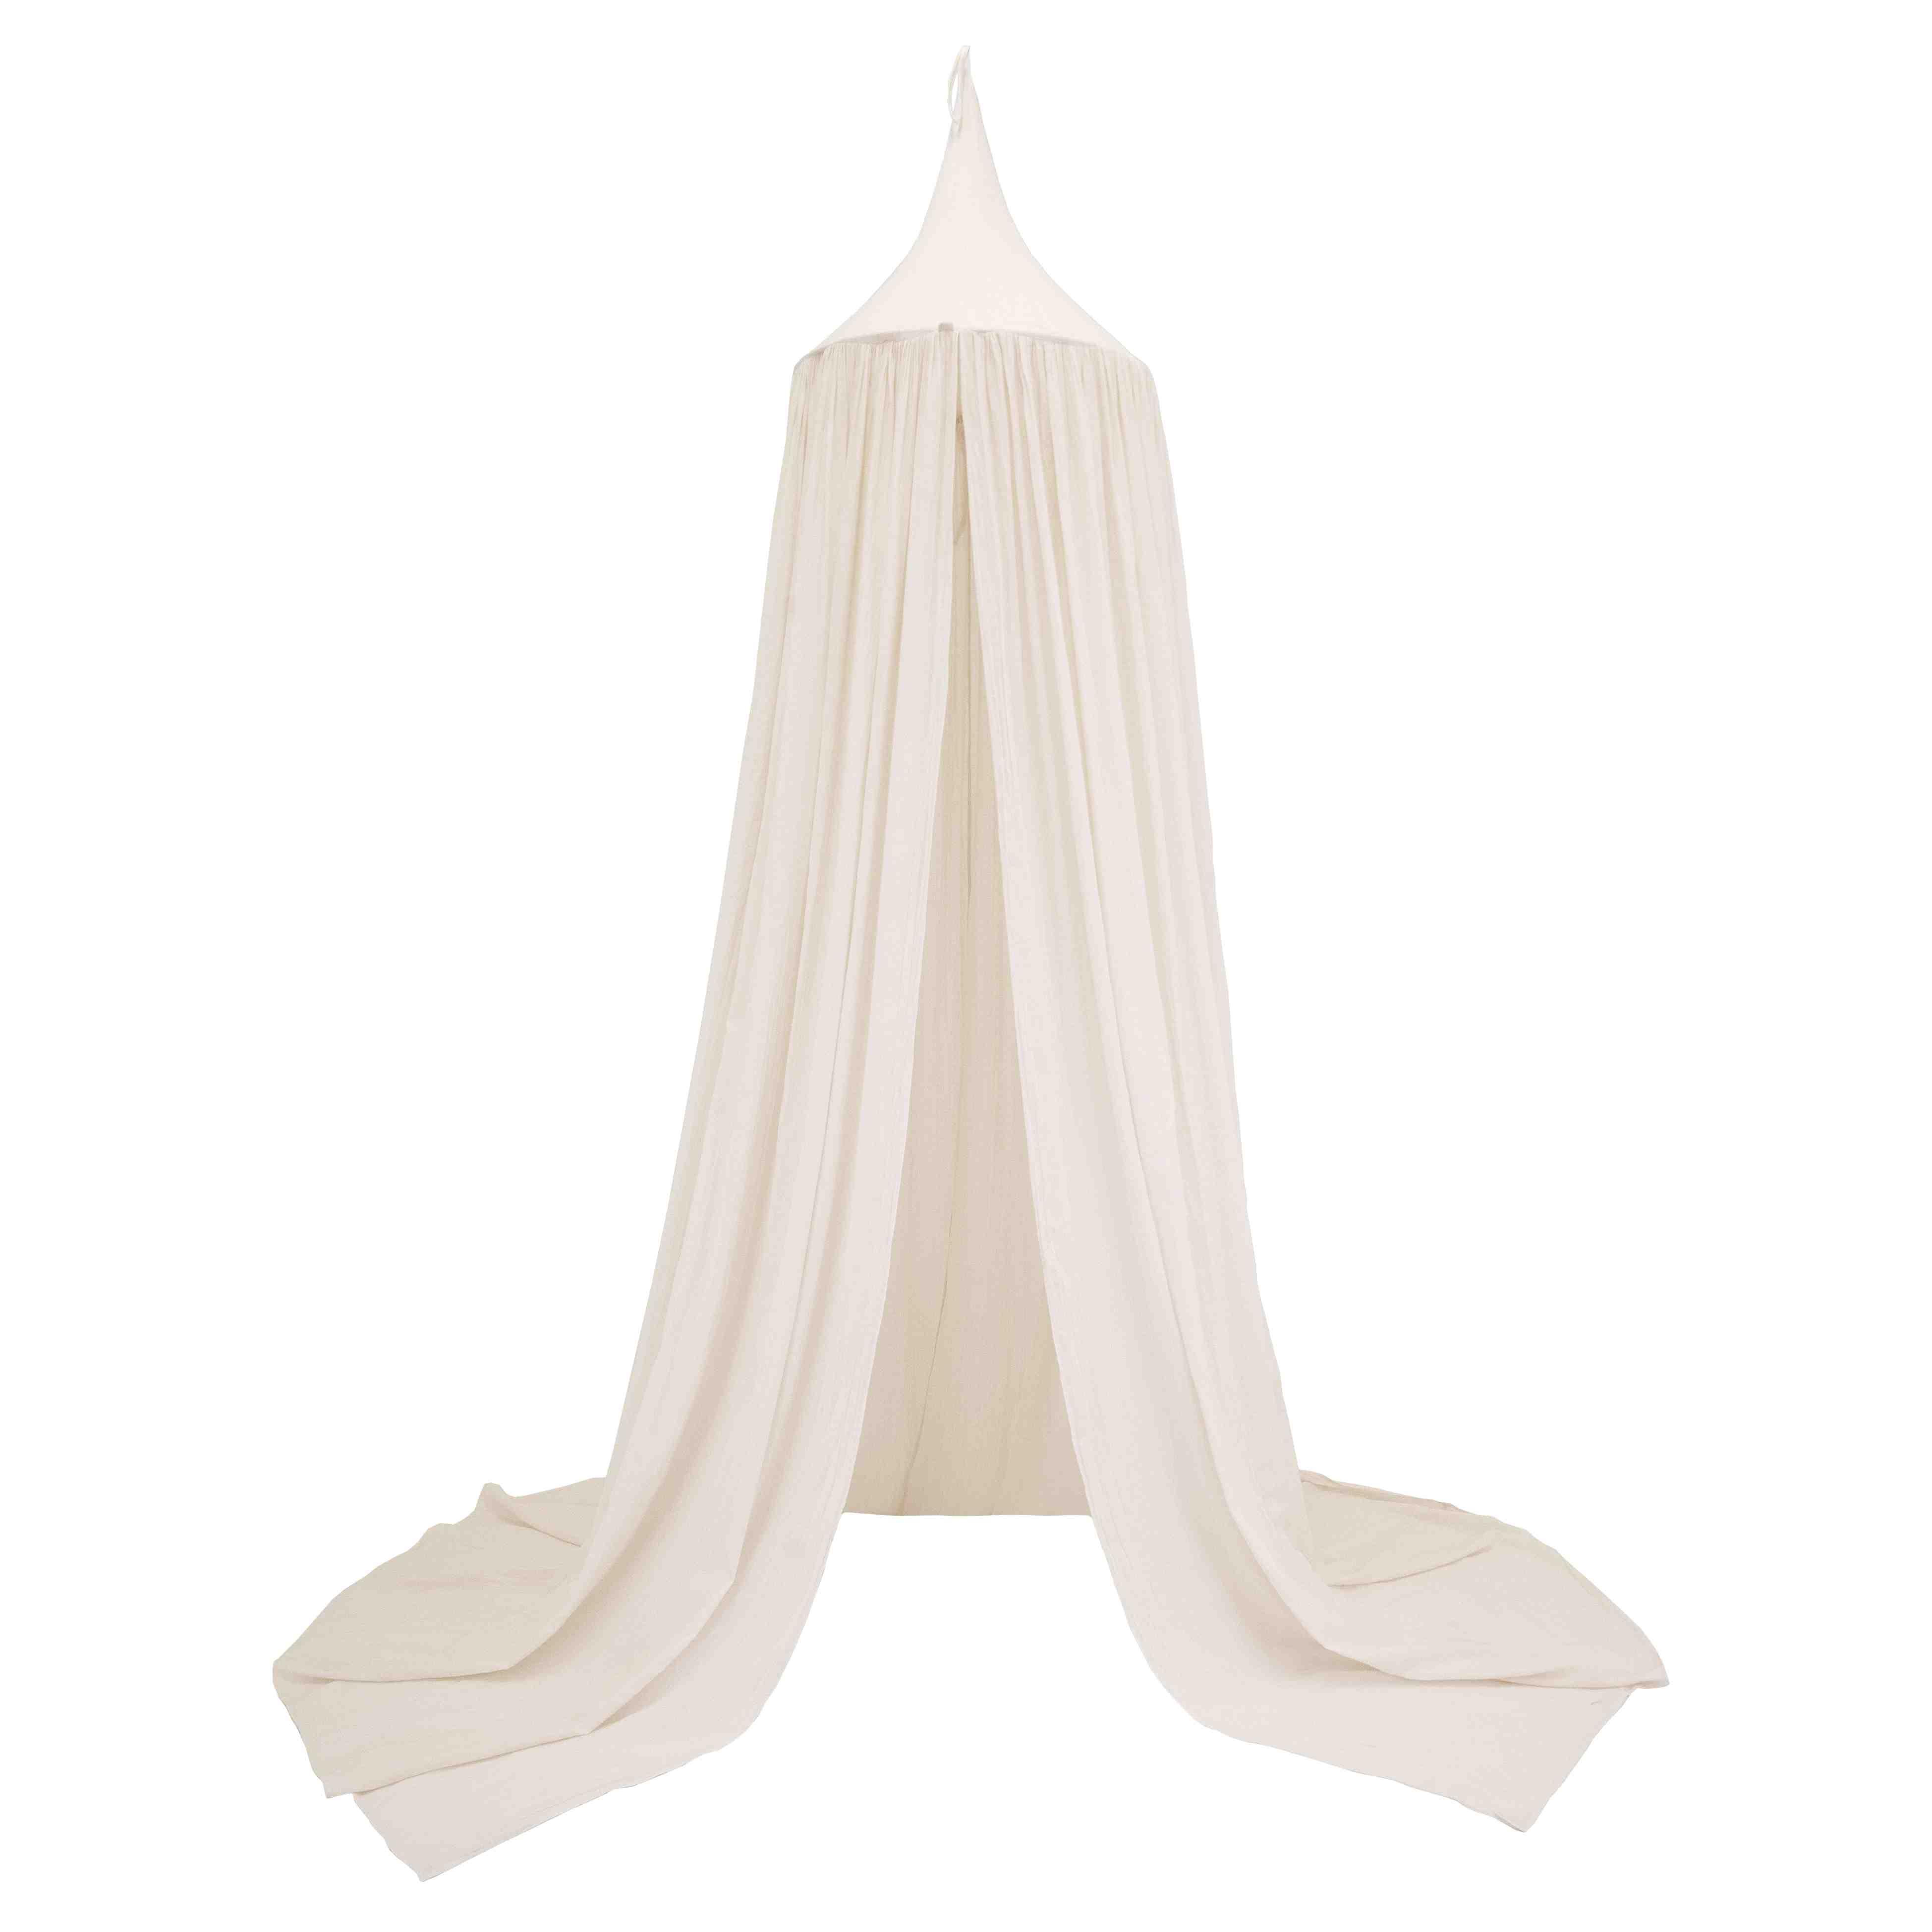 leo bella numero 74 cotton canopy natural. Black Bedroom Furniture Sets. Home Design Ideas